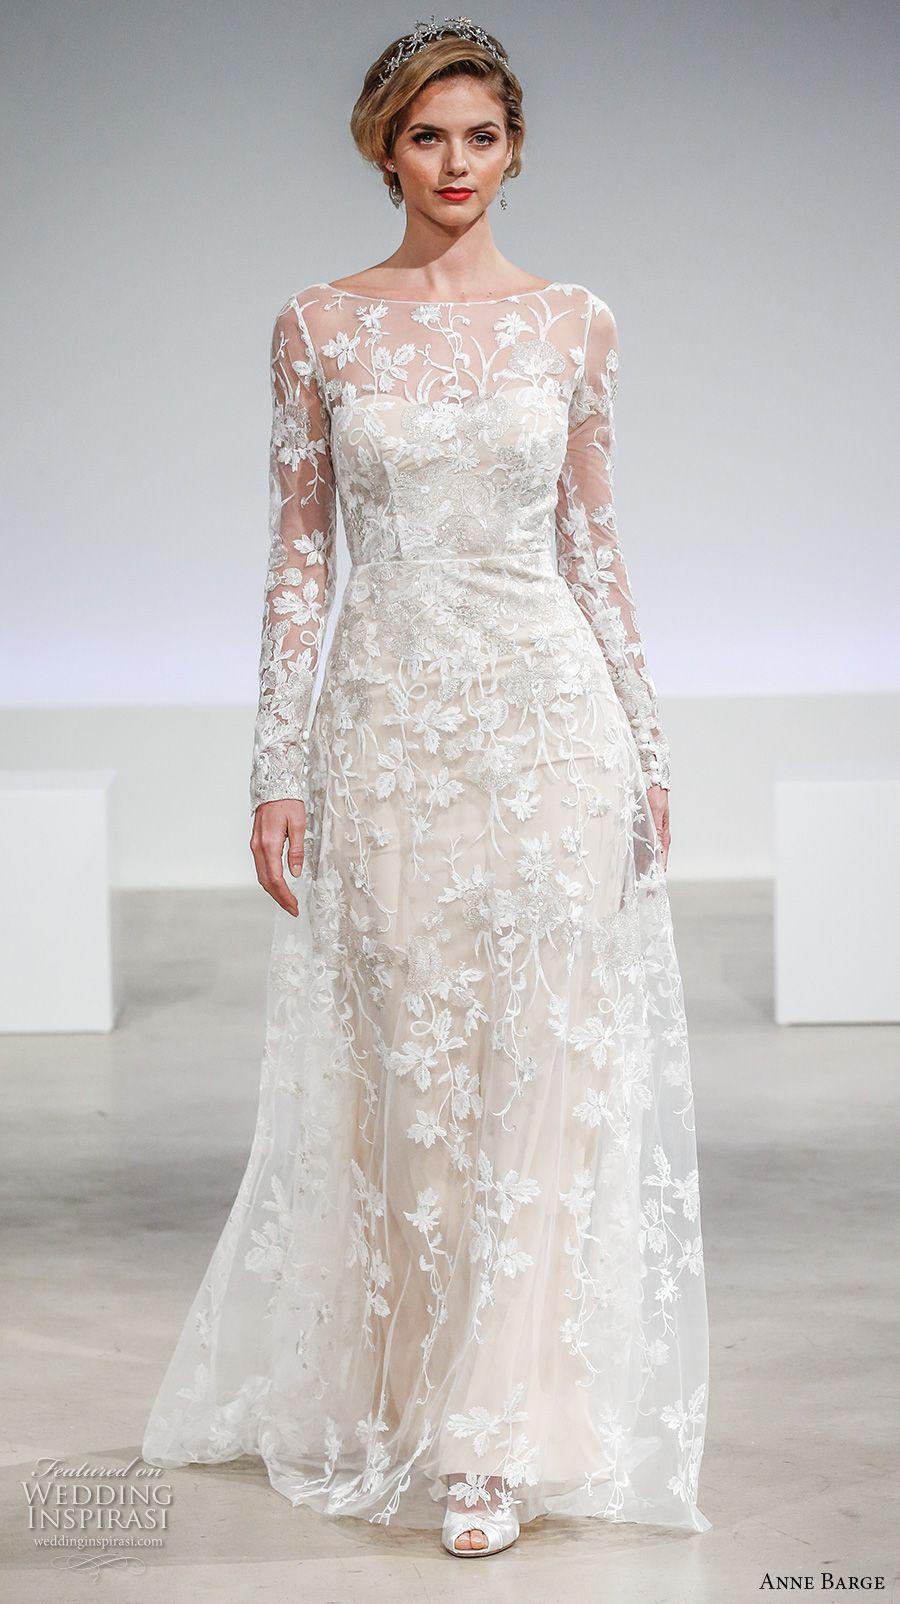 Anne Barge Fall 2017 Wedding Dresses Wedding Inspirasi Boat Neck Wedding Dress Anne Barge Wedding Dresses Wedding Dress Trends [ 1604 x 900 Pixel ]